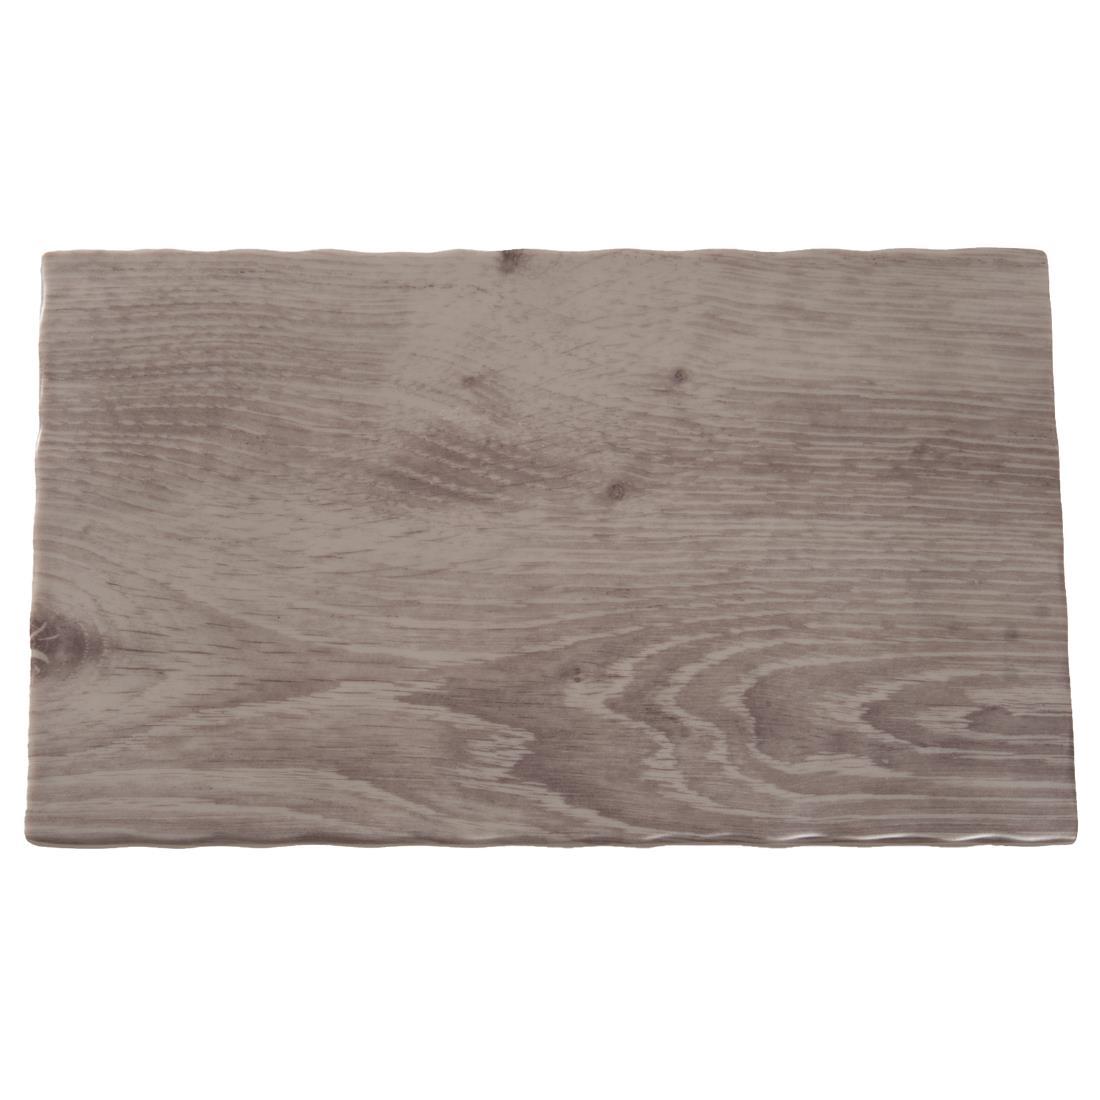 APS Wood Effect Melamine Tray GN 1/4 (GK648)